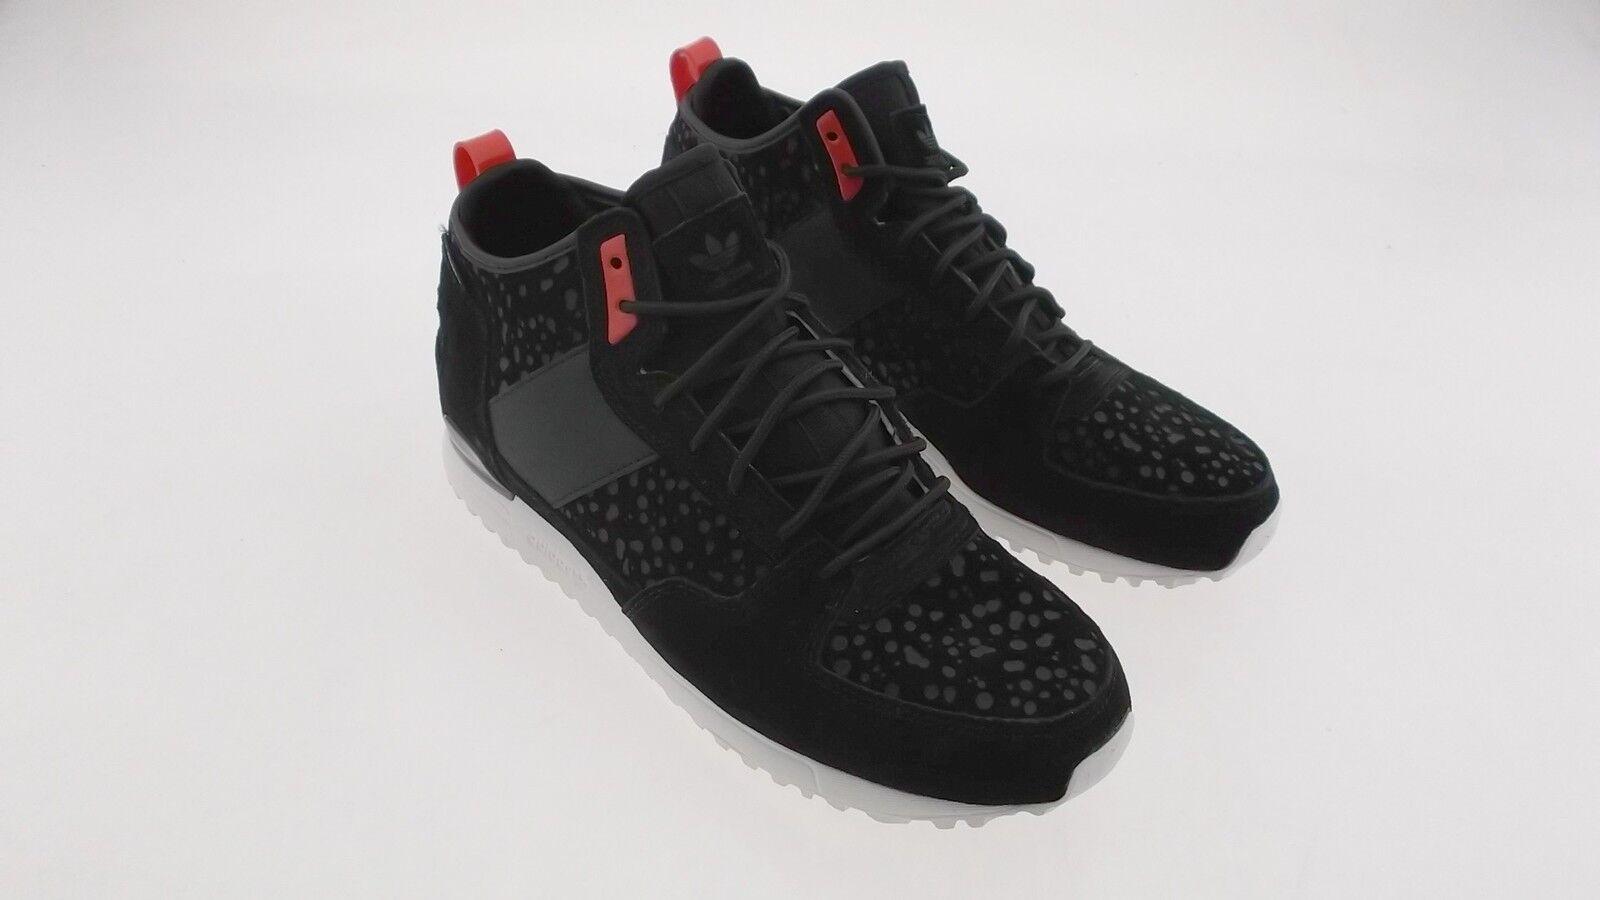 Adidas Hombre M20997 Militar Trail Runner (Negro/CNegro/Whtvap) M20997 Hombre e819ed